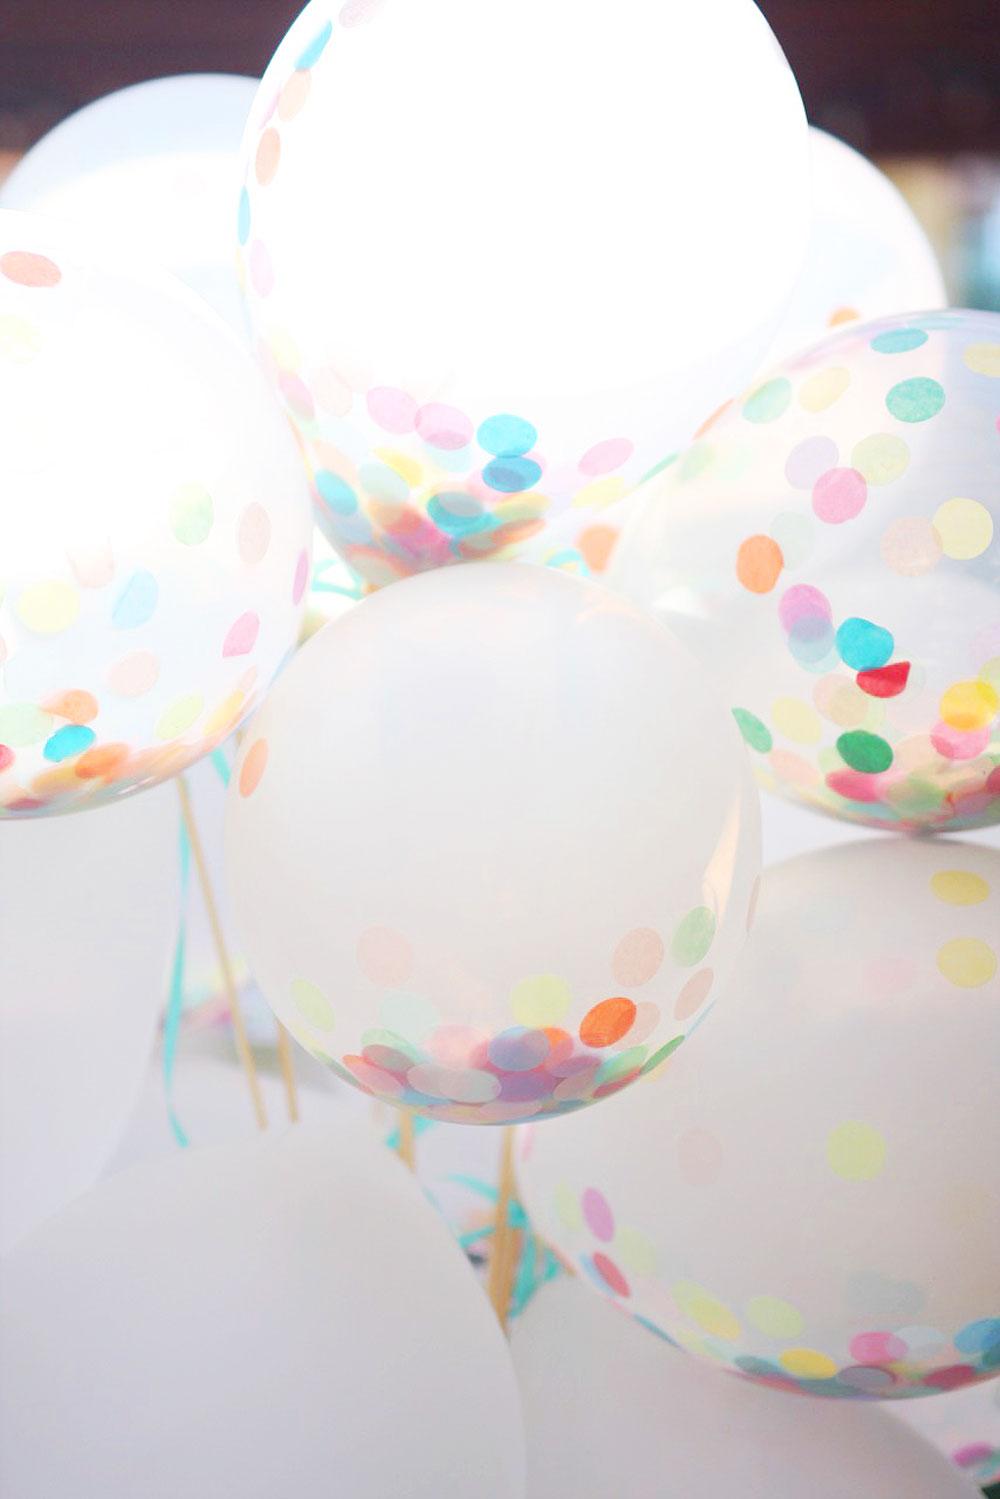 jestcafe.com-balloon-confetti3